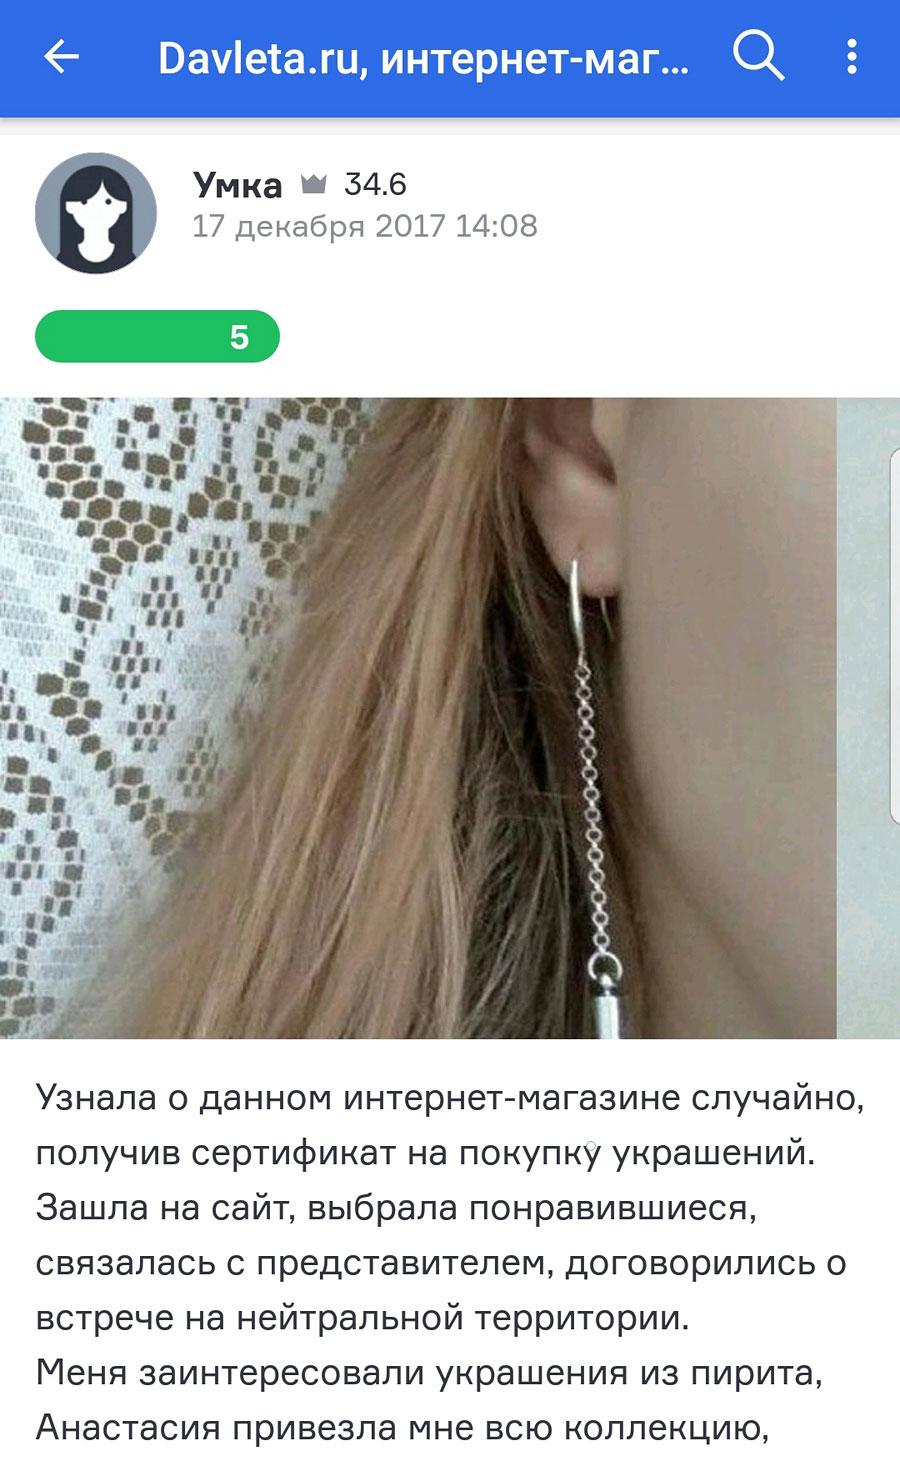 Отзыв: Умка Фламп Красноярск